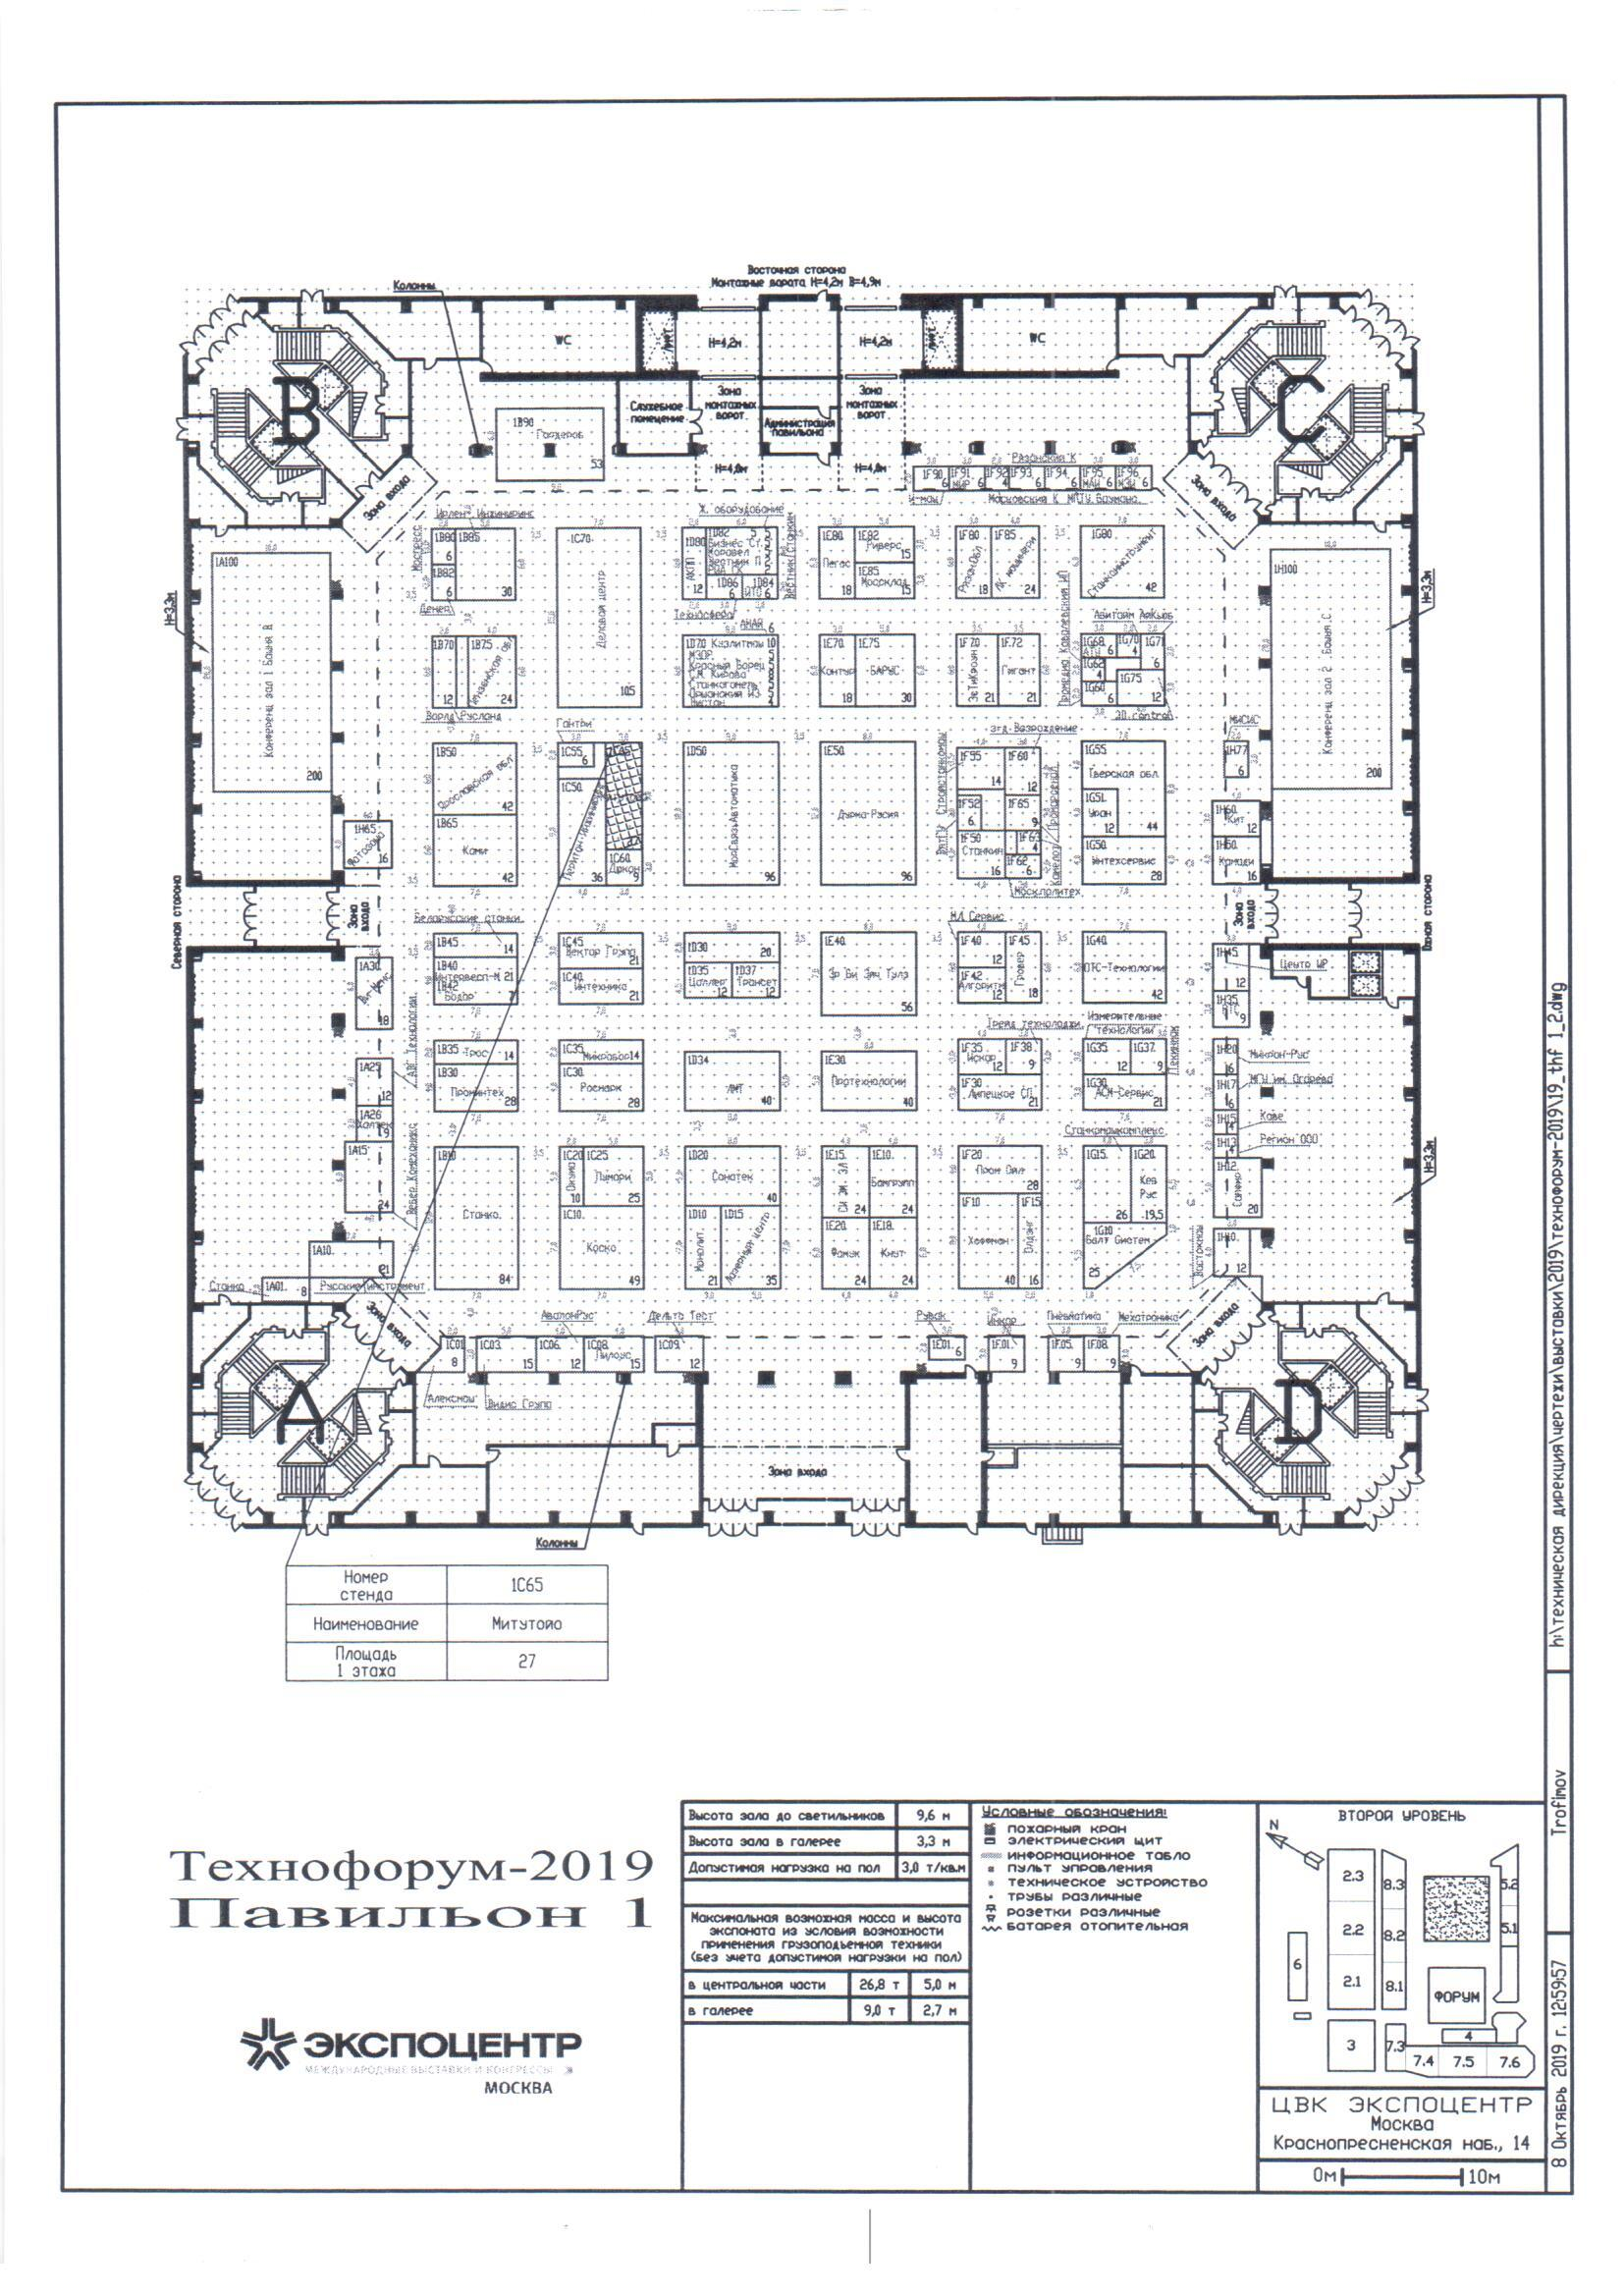 Технофорум 2019 - план павильона